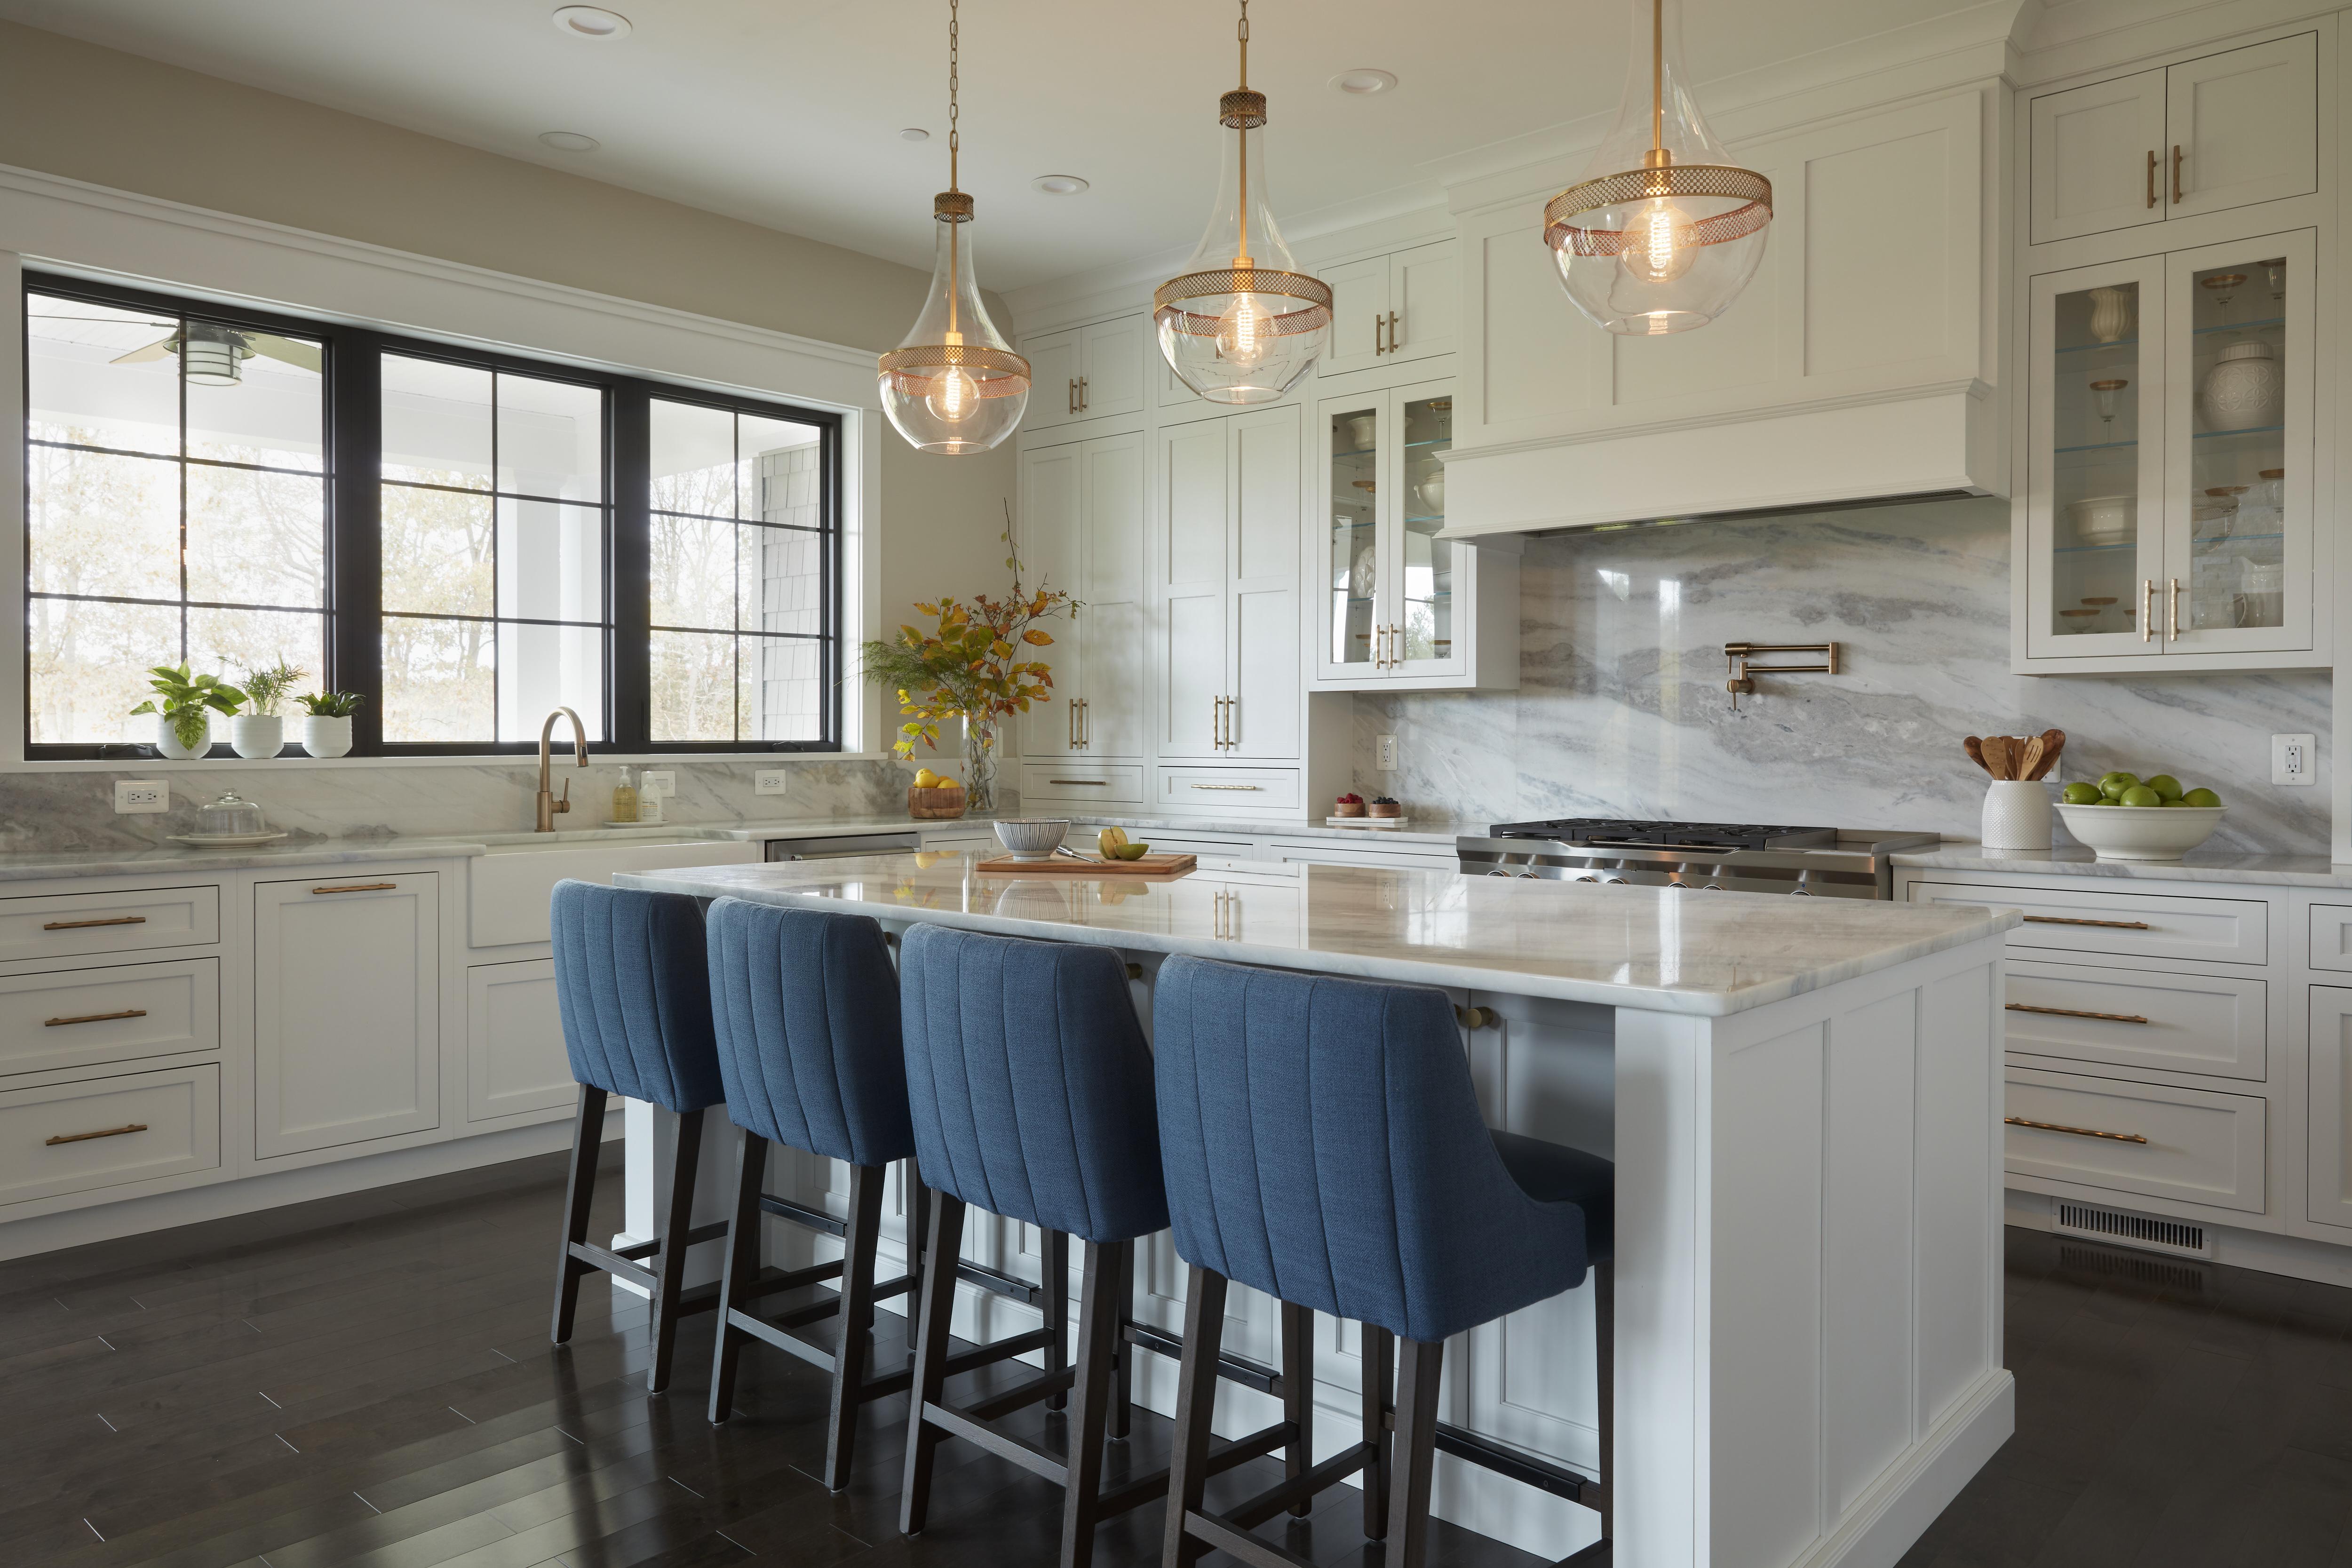 Kitchen Island lighting, Bar stools and marble back splash